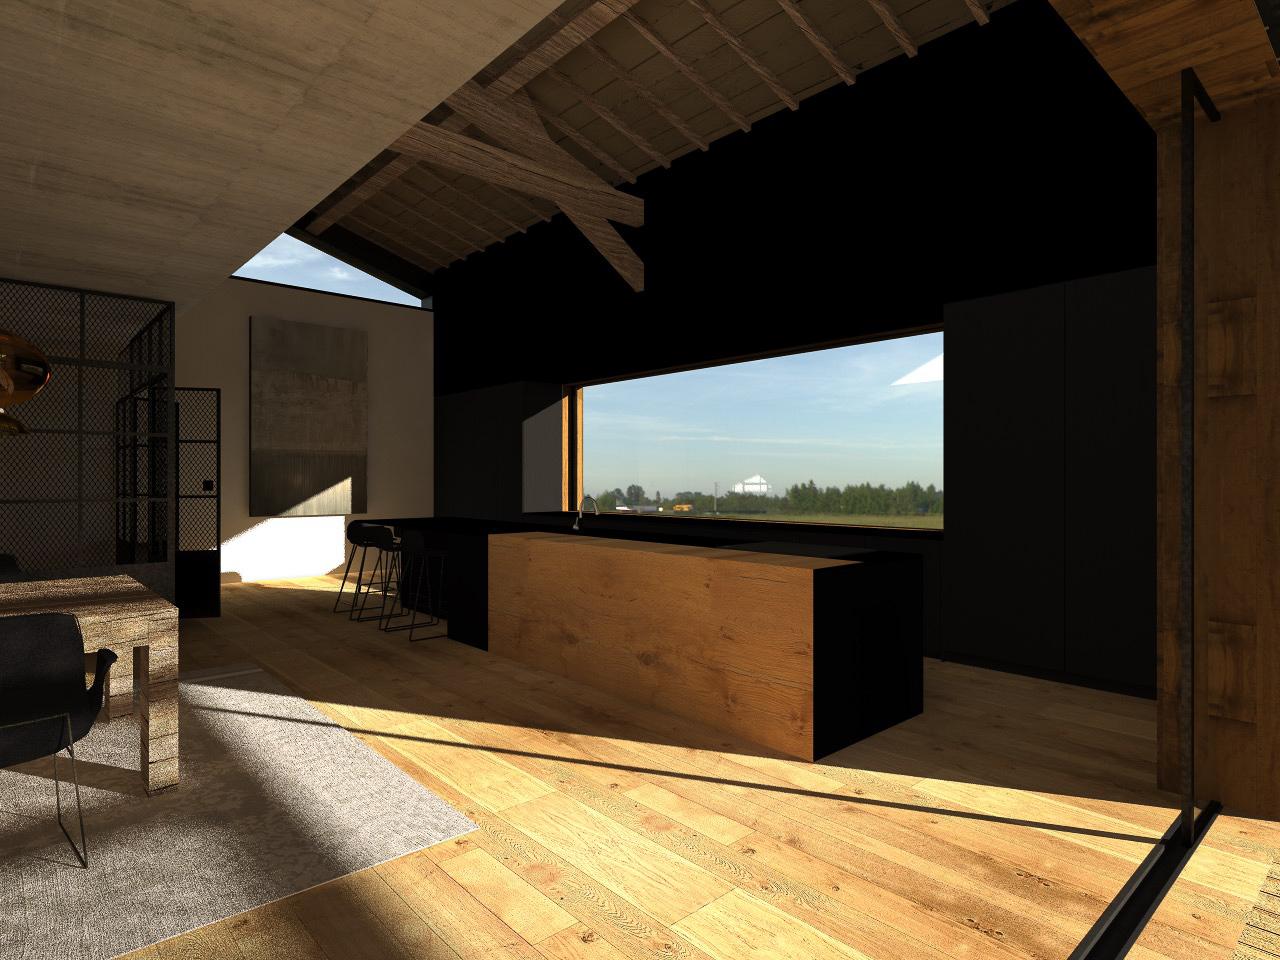 renover-rehabilitation-ferme-grange-architecte-façade-travaux-permis-de-construire-6